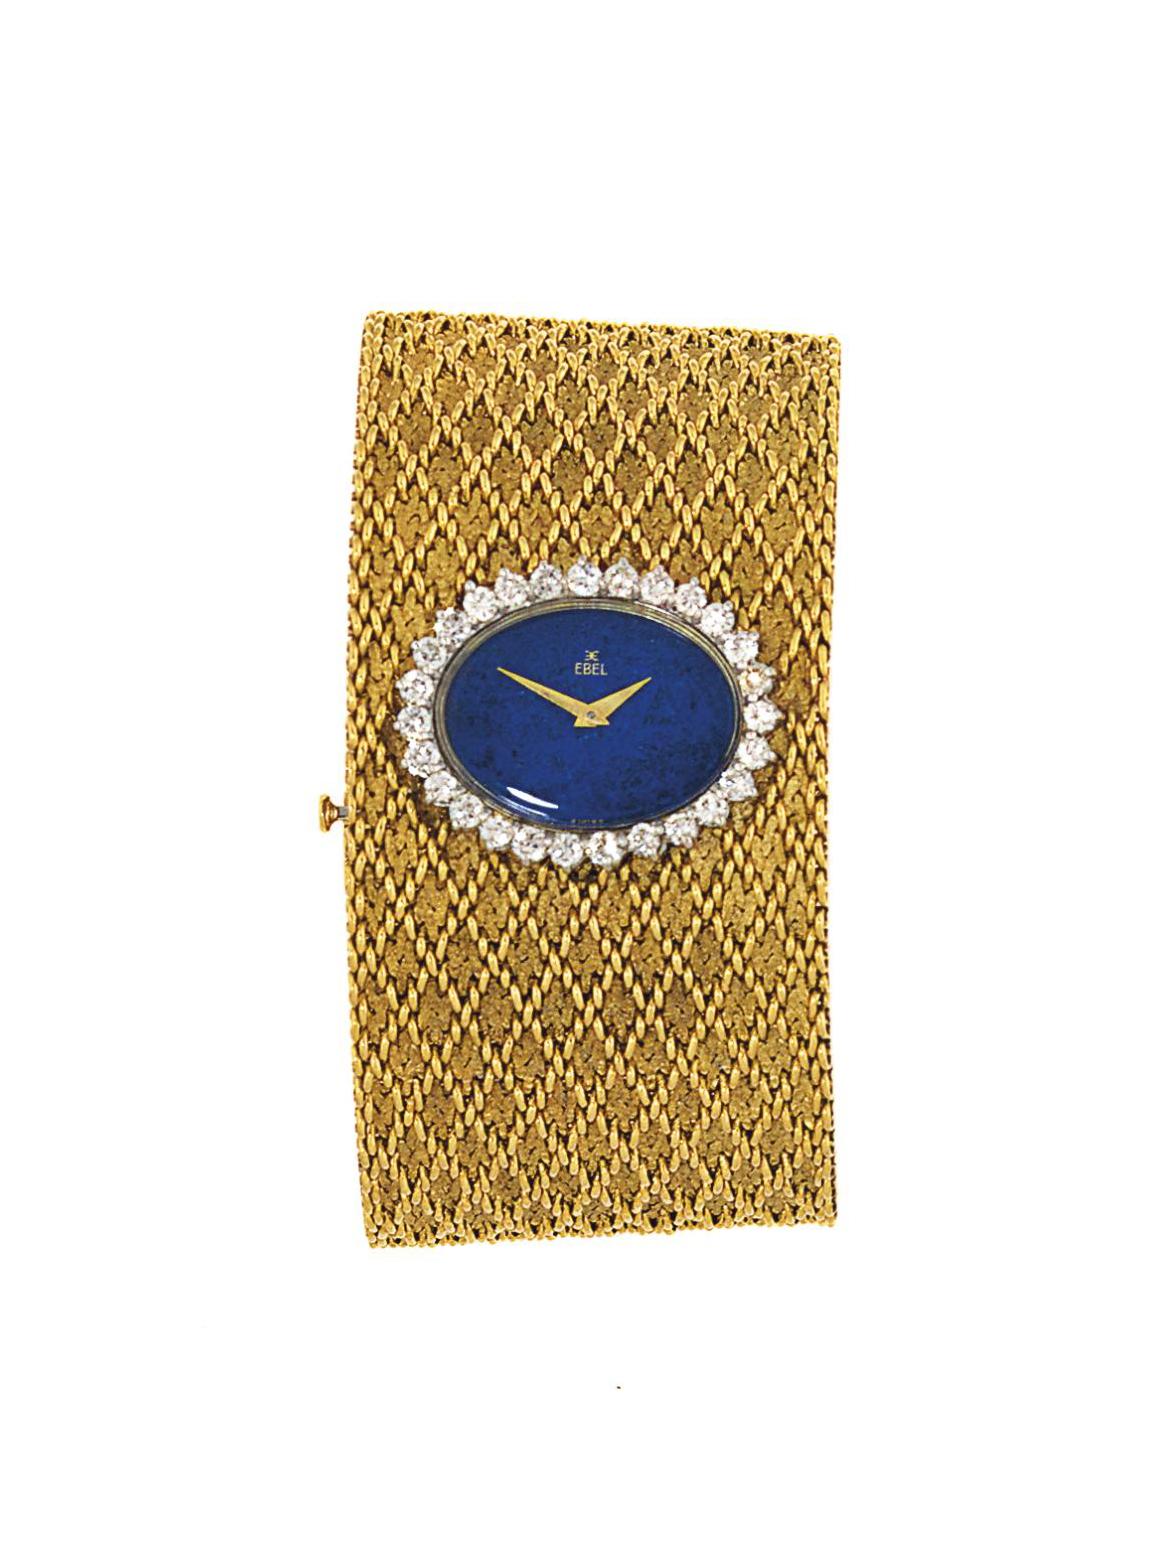 A lapis lazuli and diamond-set bracelet watch, by Ebel